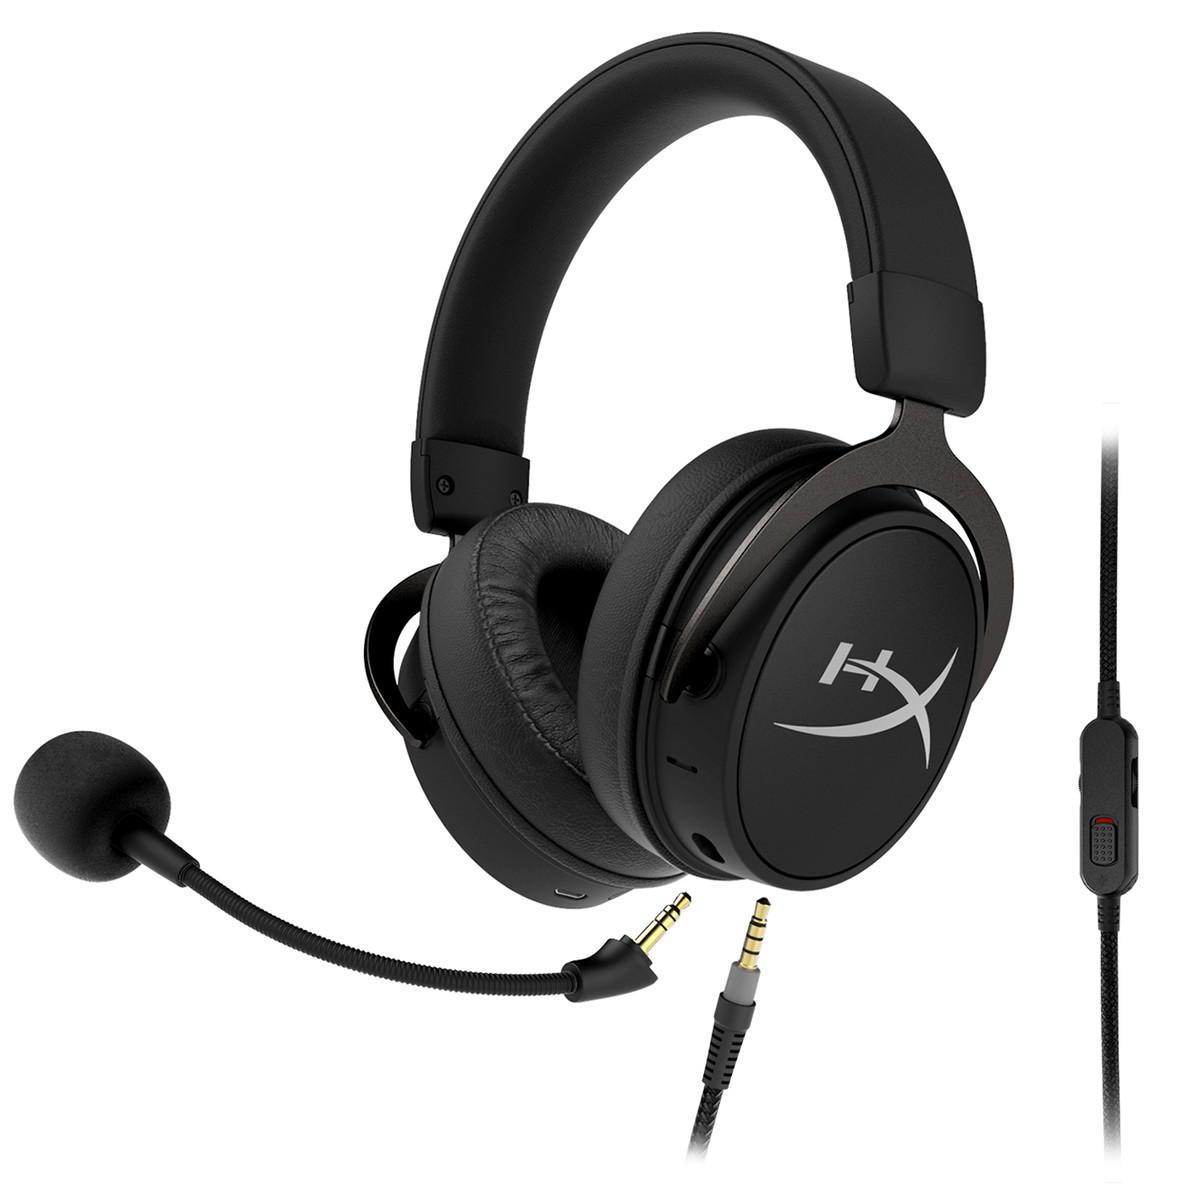 HyperX Cloud Mix Review: Everyday set of Headphones?